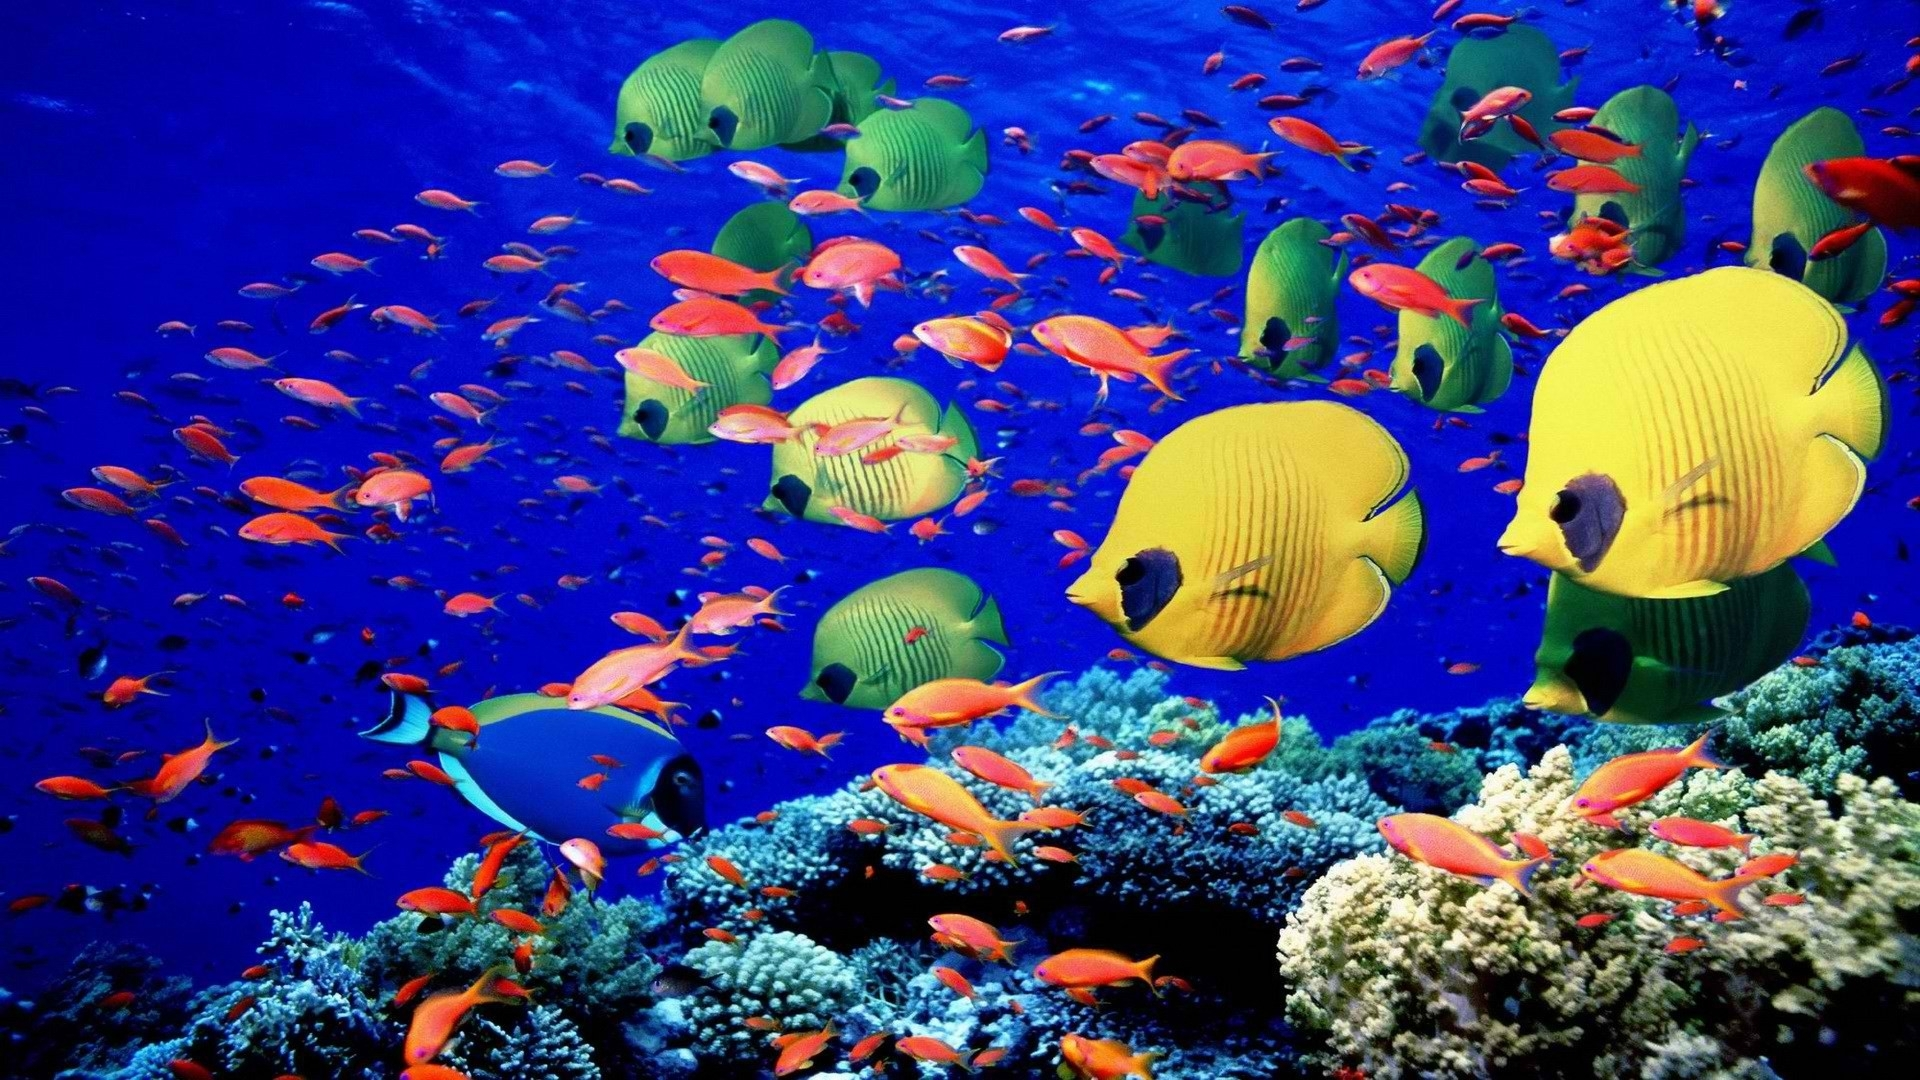 fishes underwater swim coral reef colors bright sea life wallpaper 1920x1080